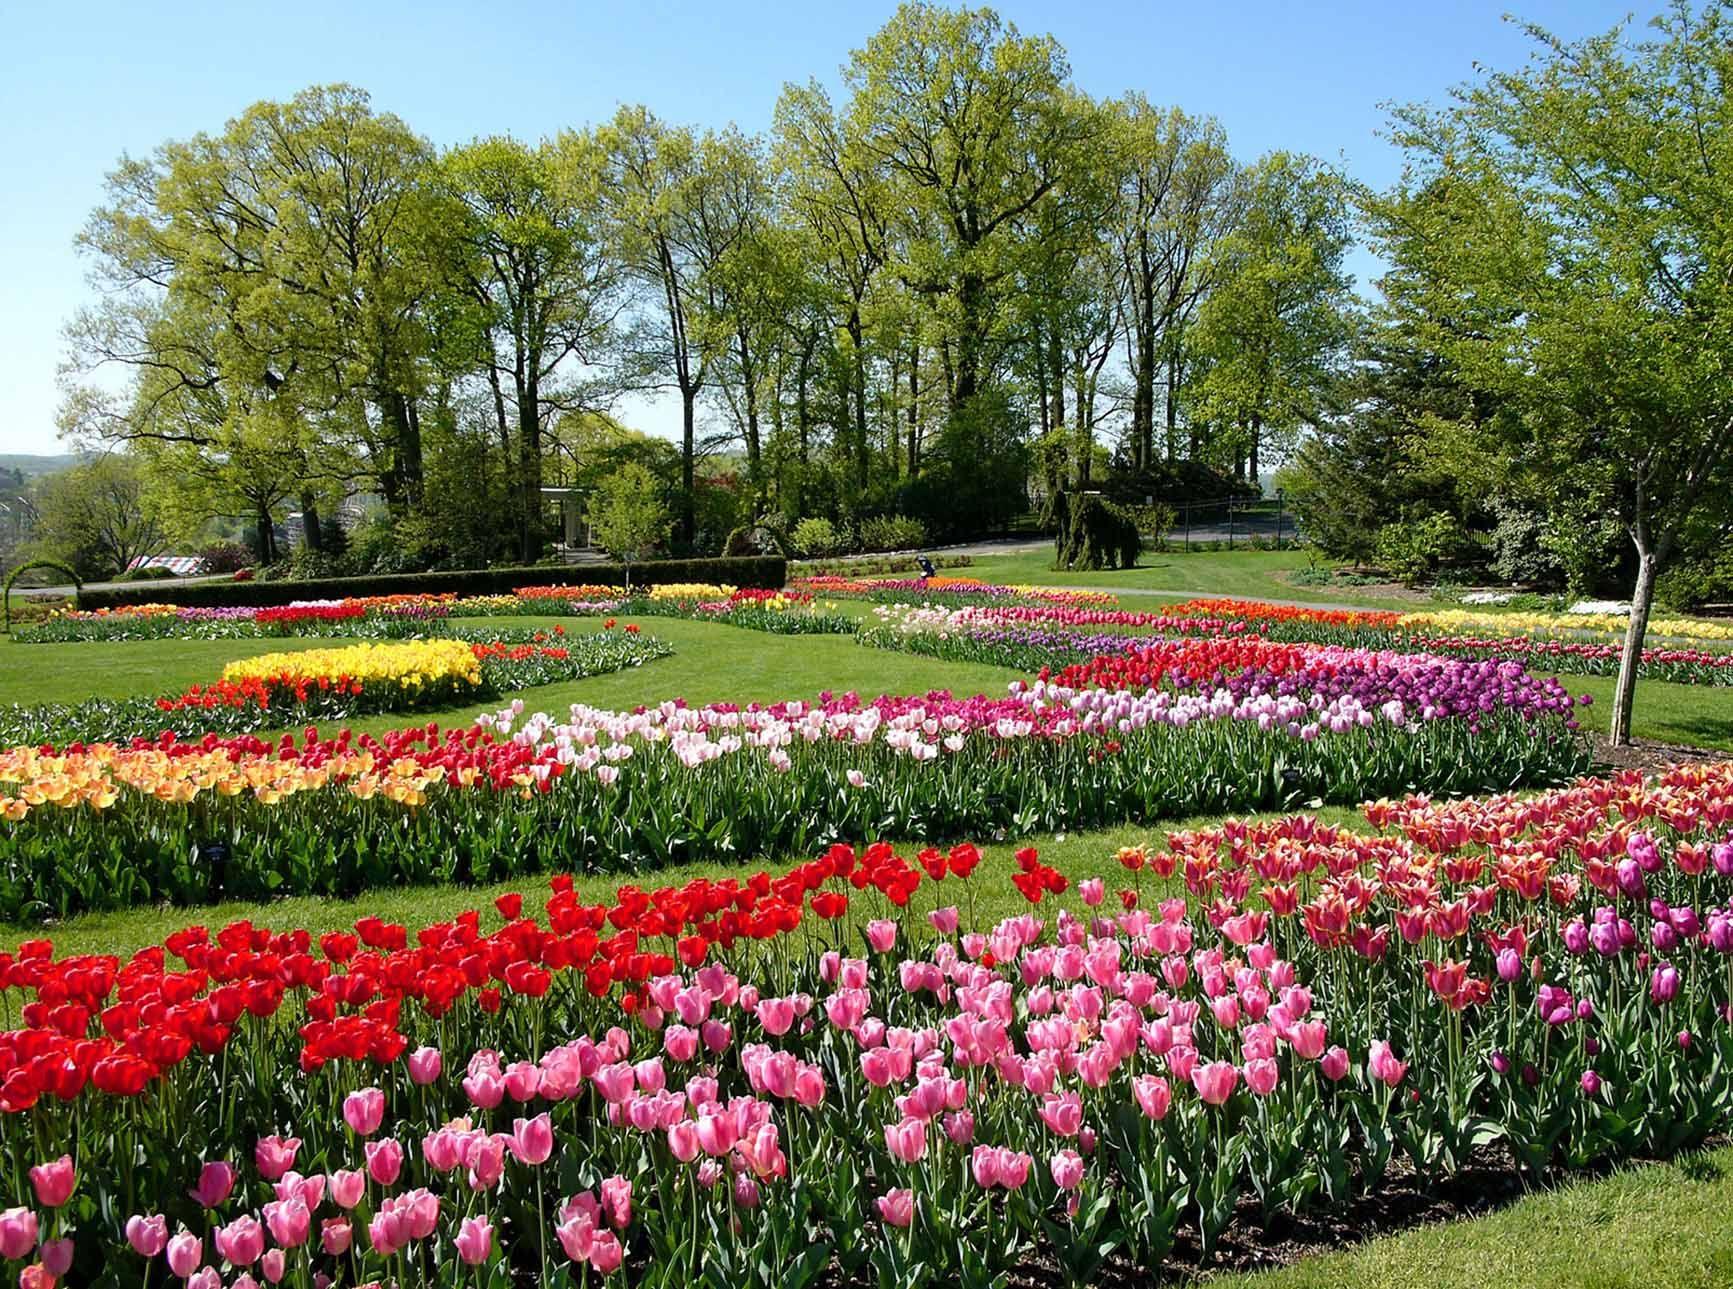 Populares Wallpaper de flores coloridas no jardim   Jardins e campos de  OV18